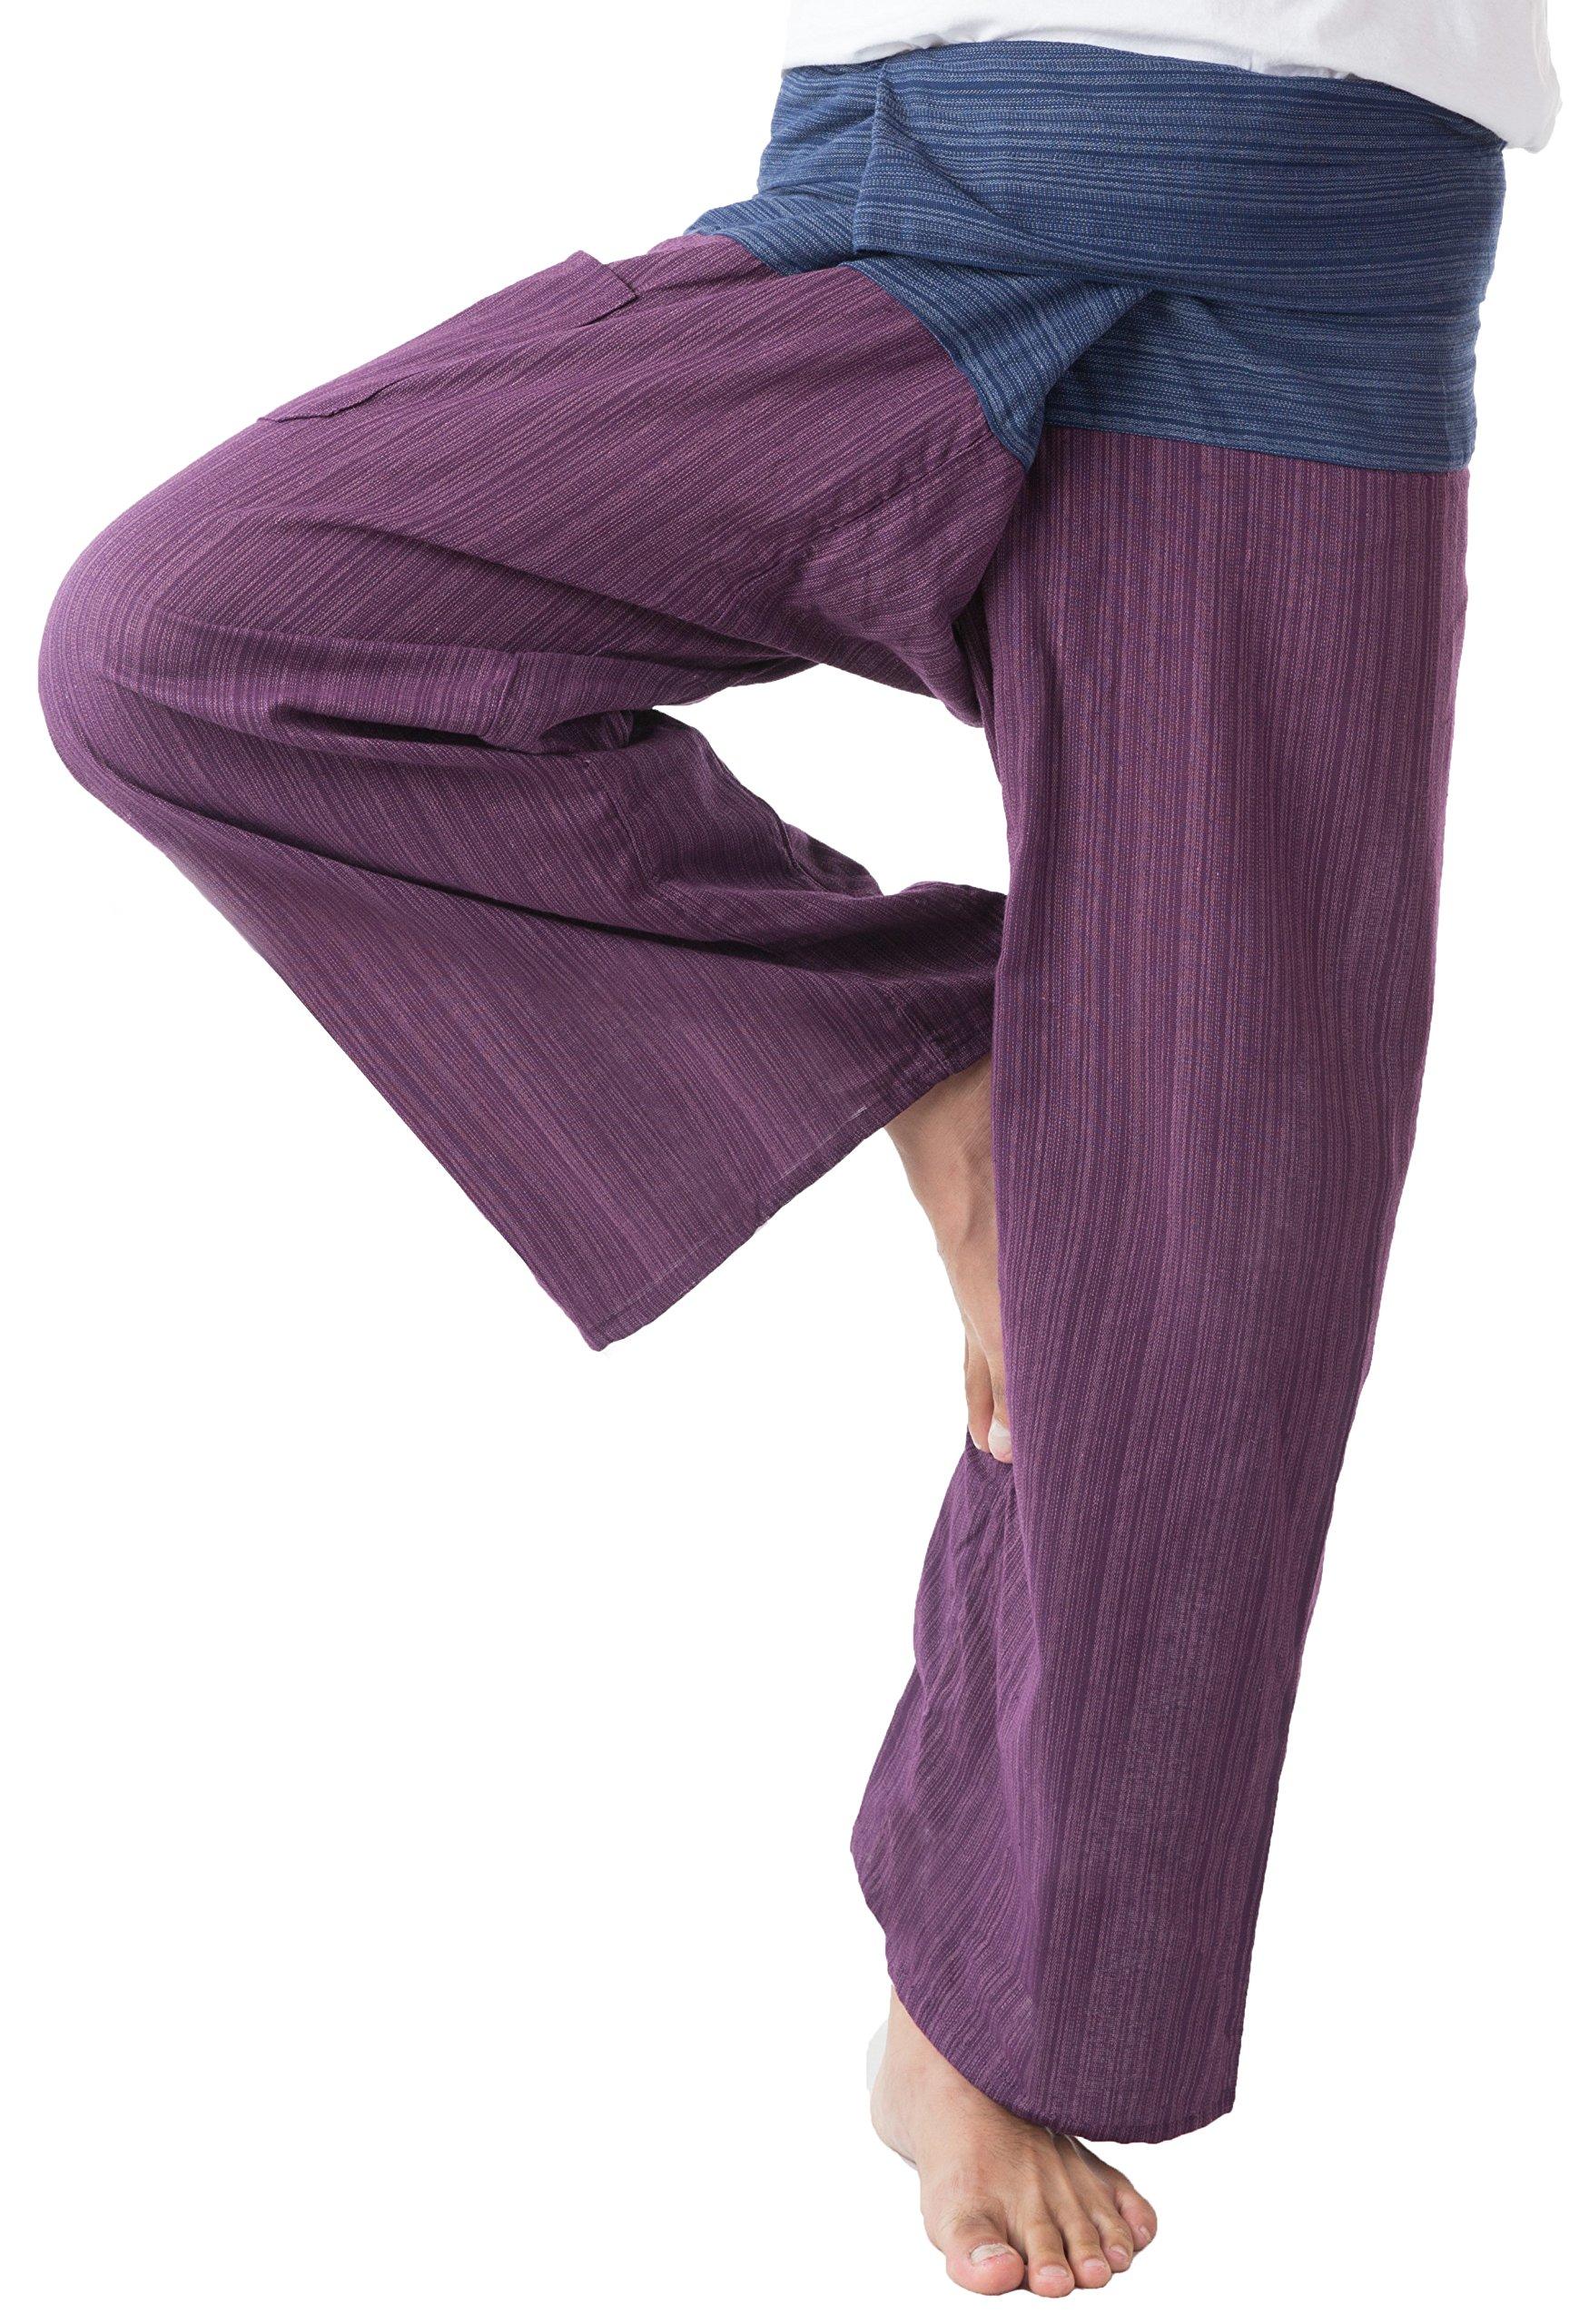 Thai Fisherman Pants Men's Yoga Trousers Blue and Maroon 2 Tone Pant